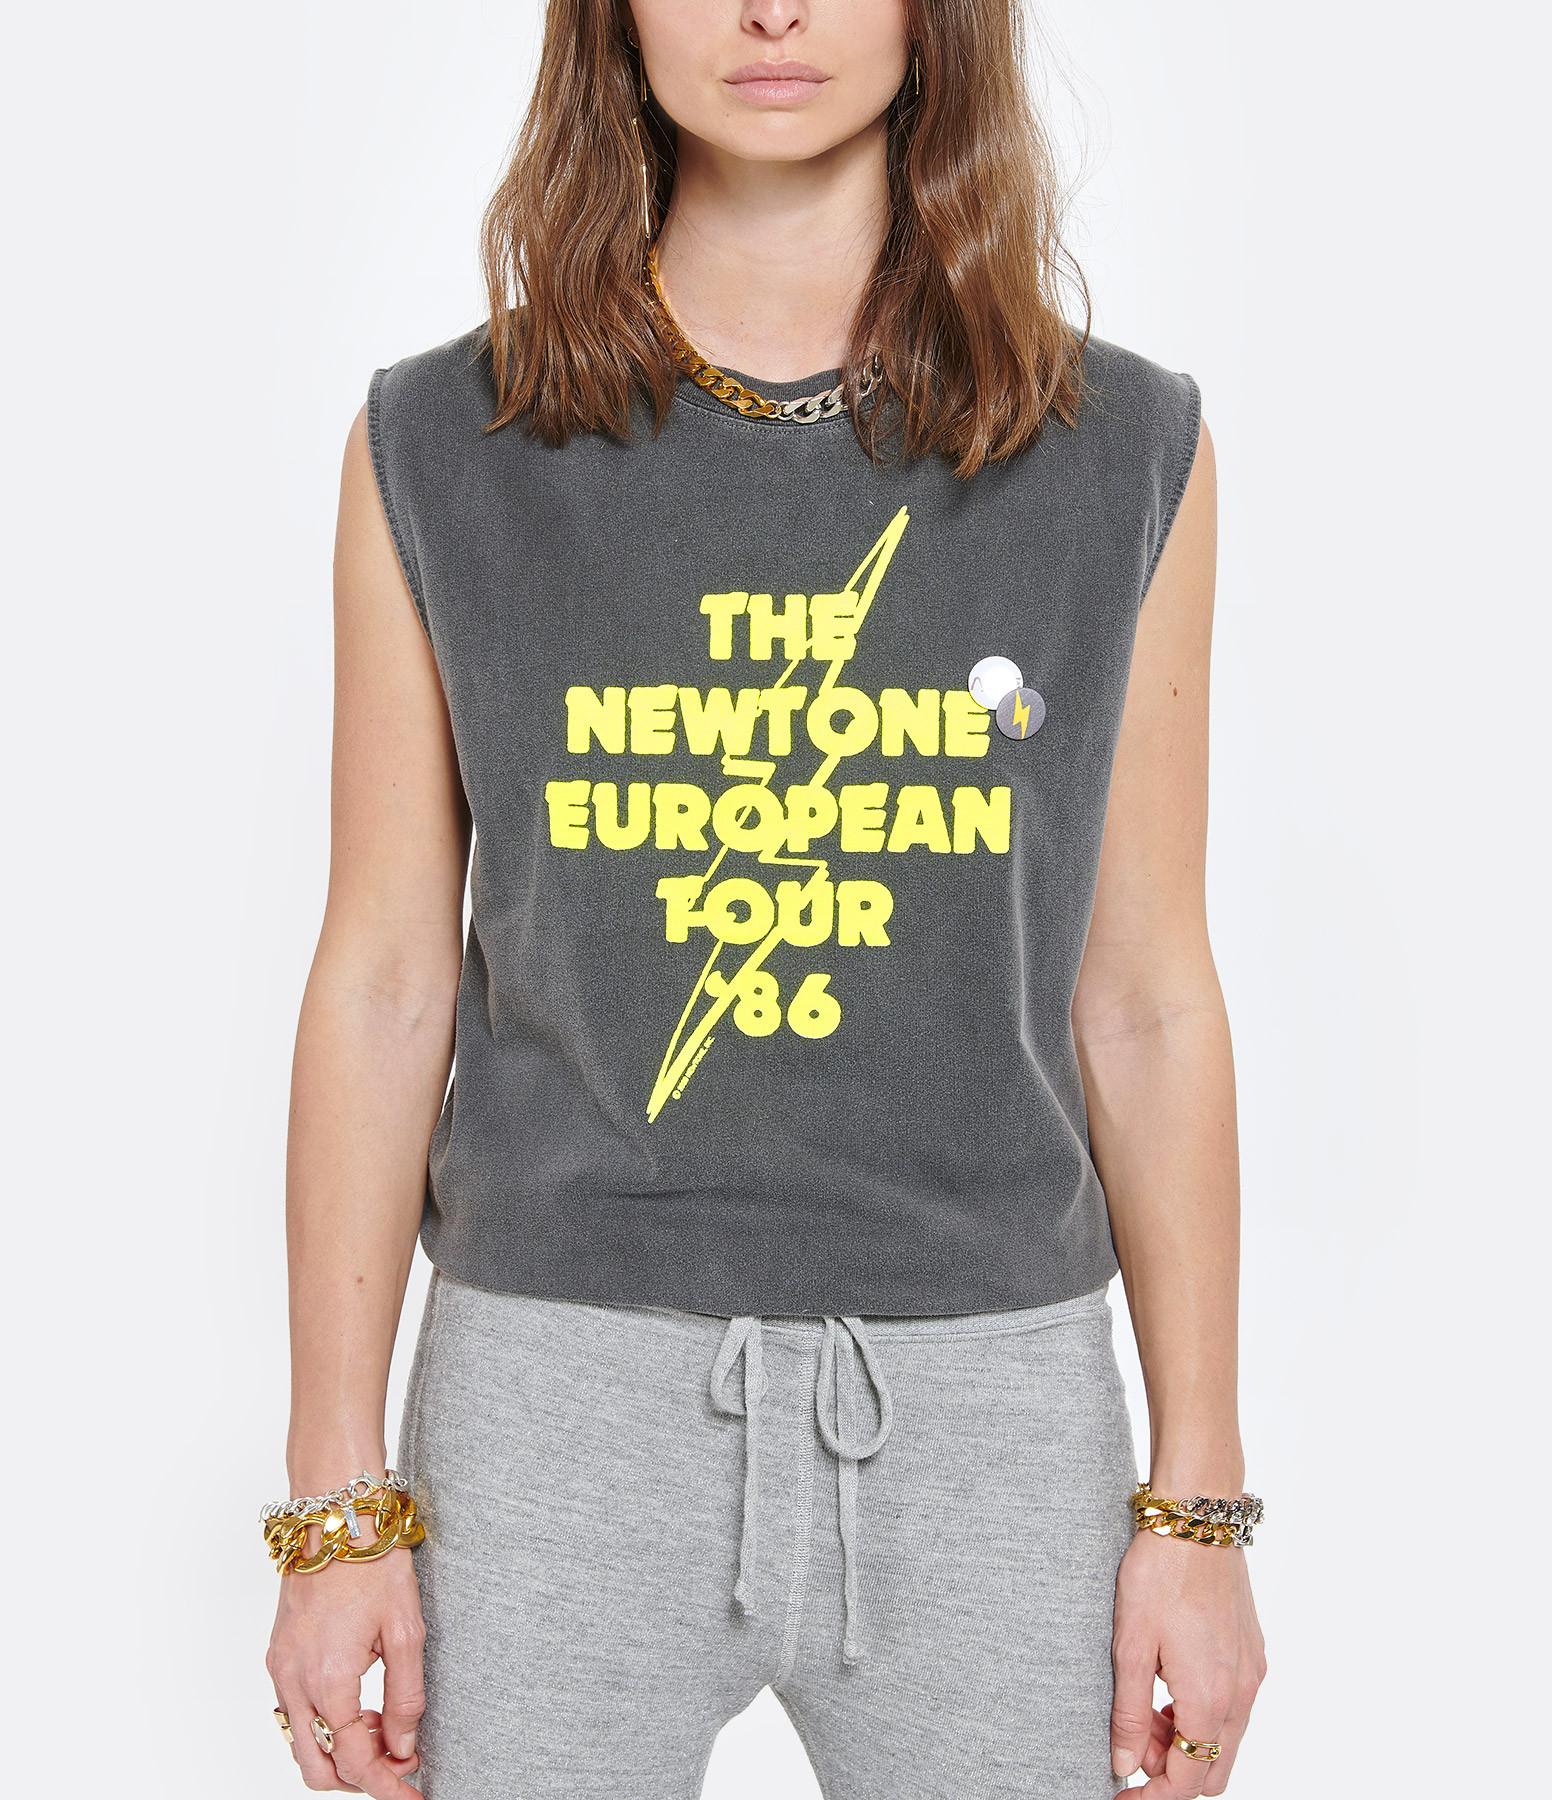 NEWTONE - Tee-shirt Biker Europe Coton Pepper